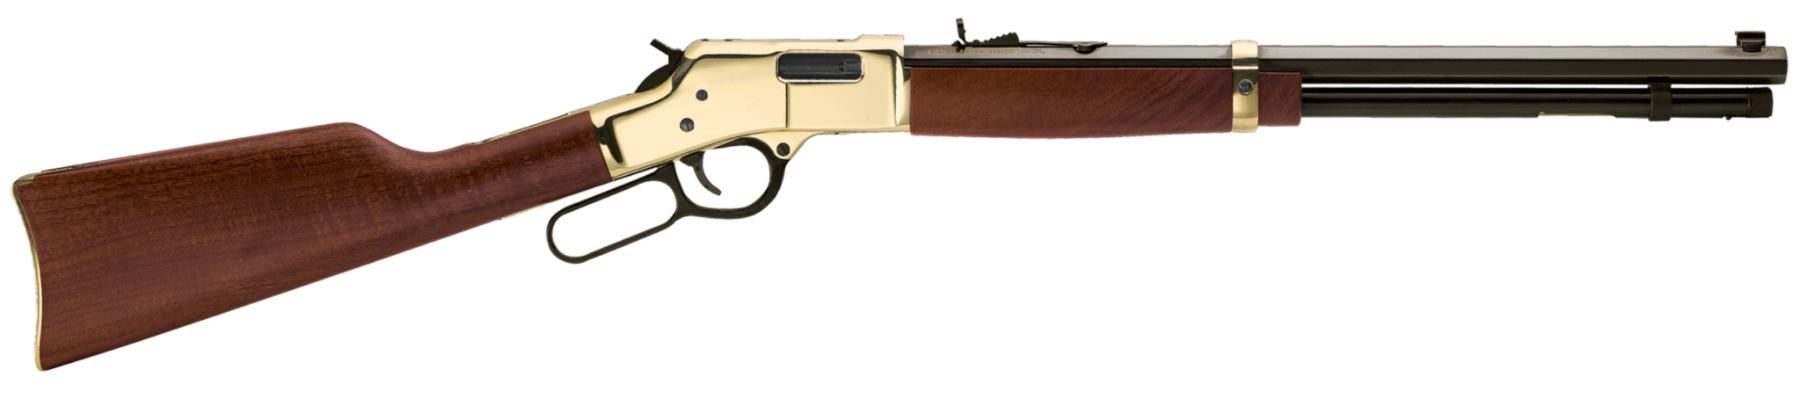 Henry Big Boy Rifles